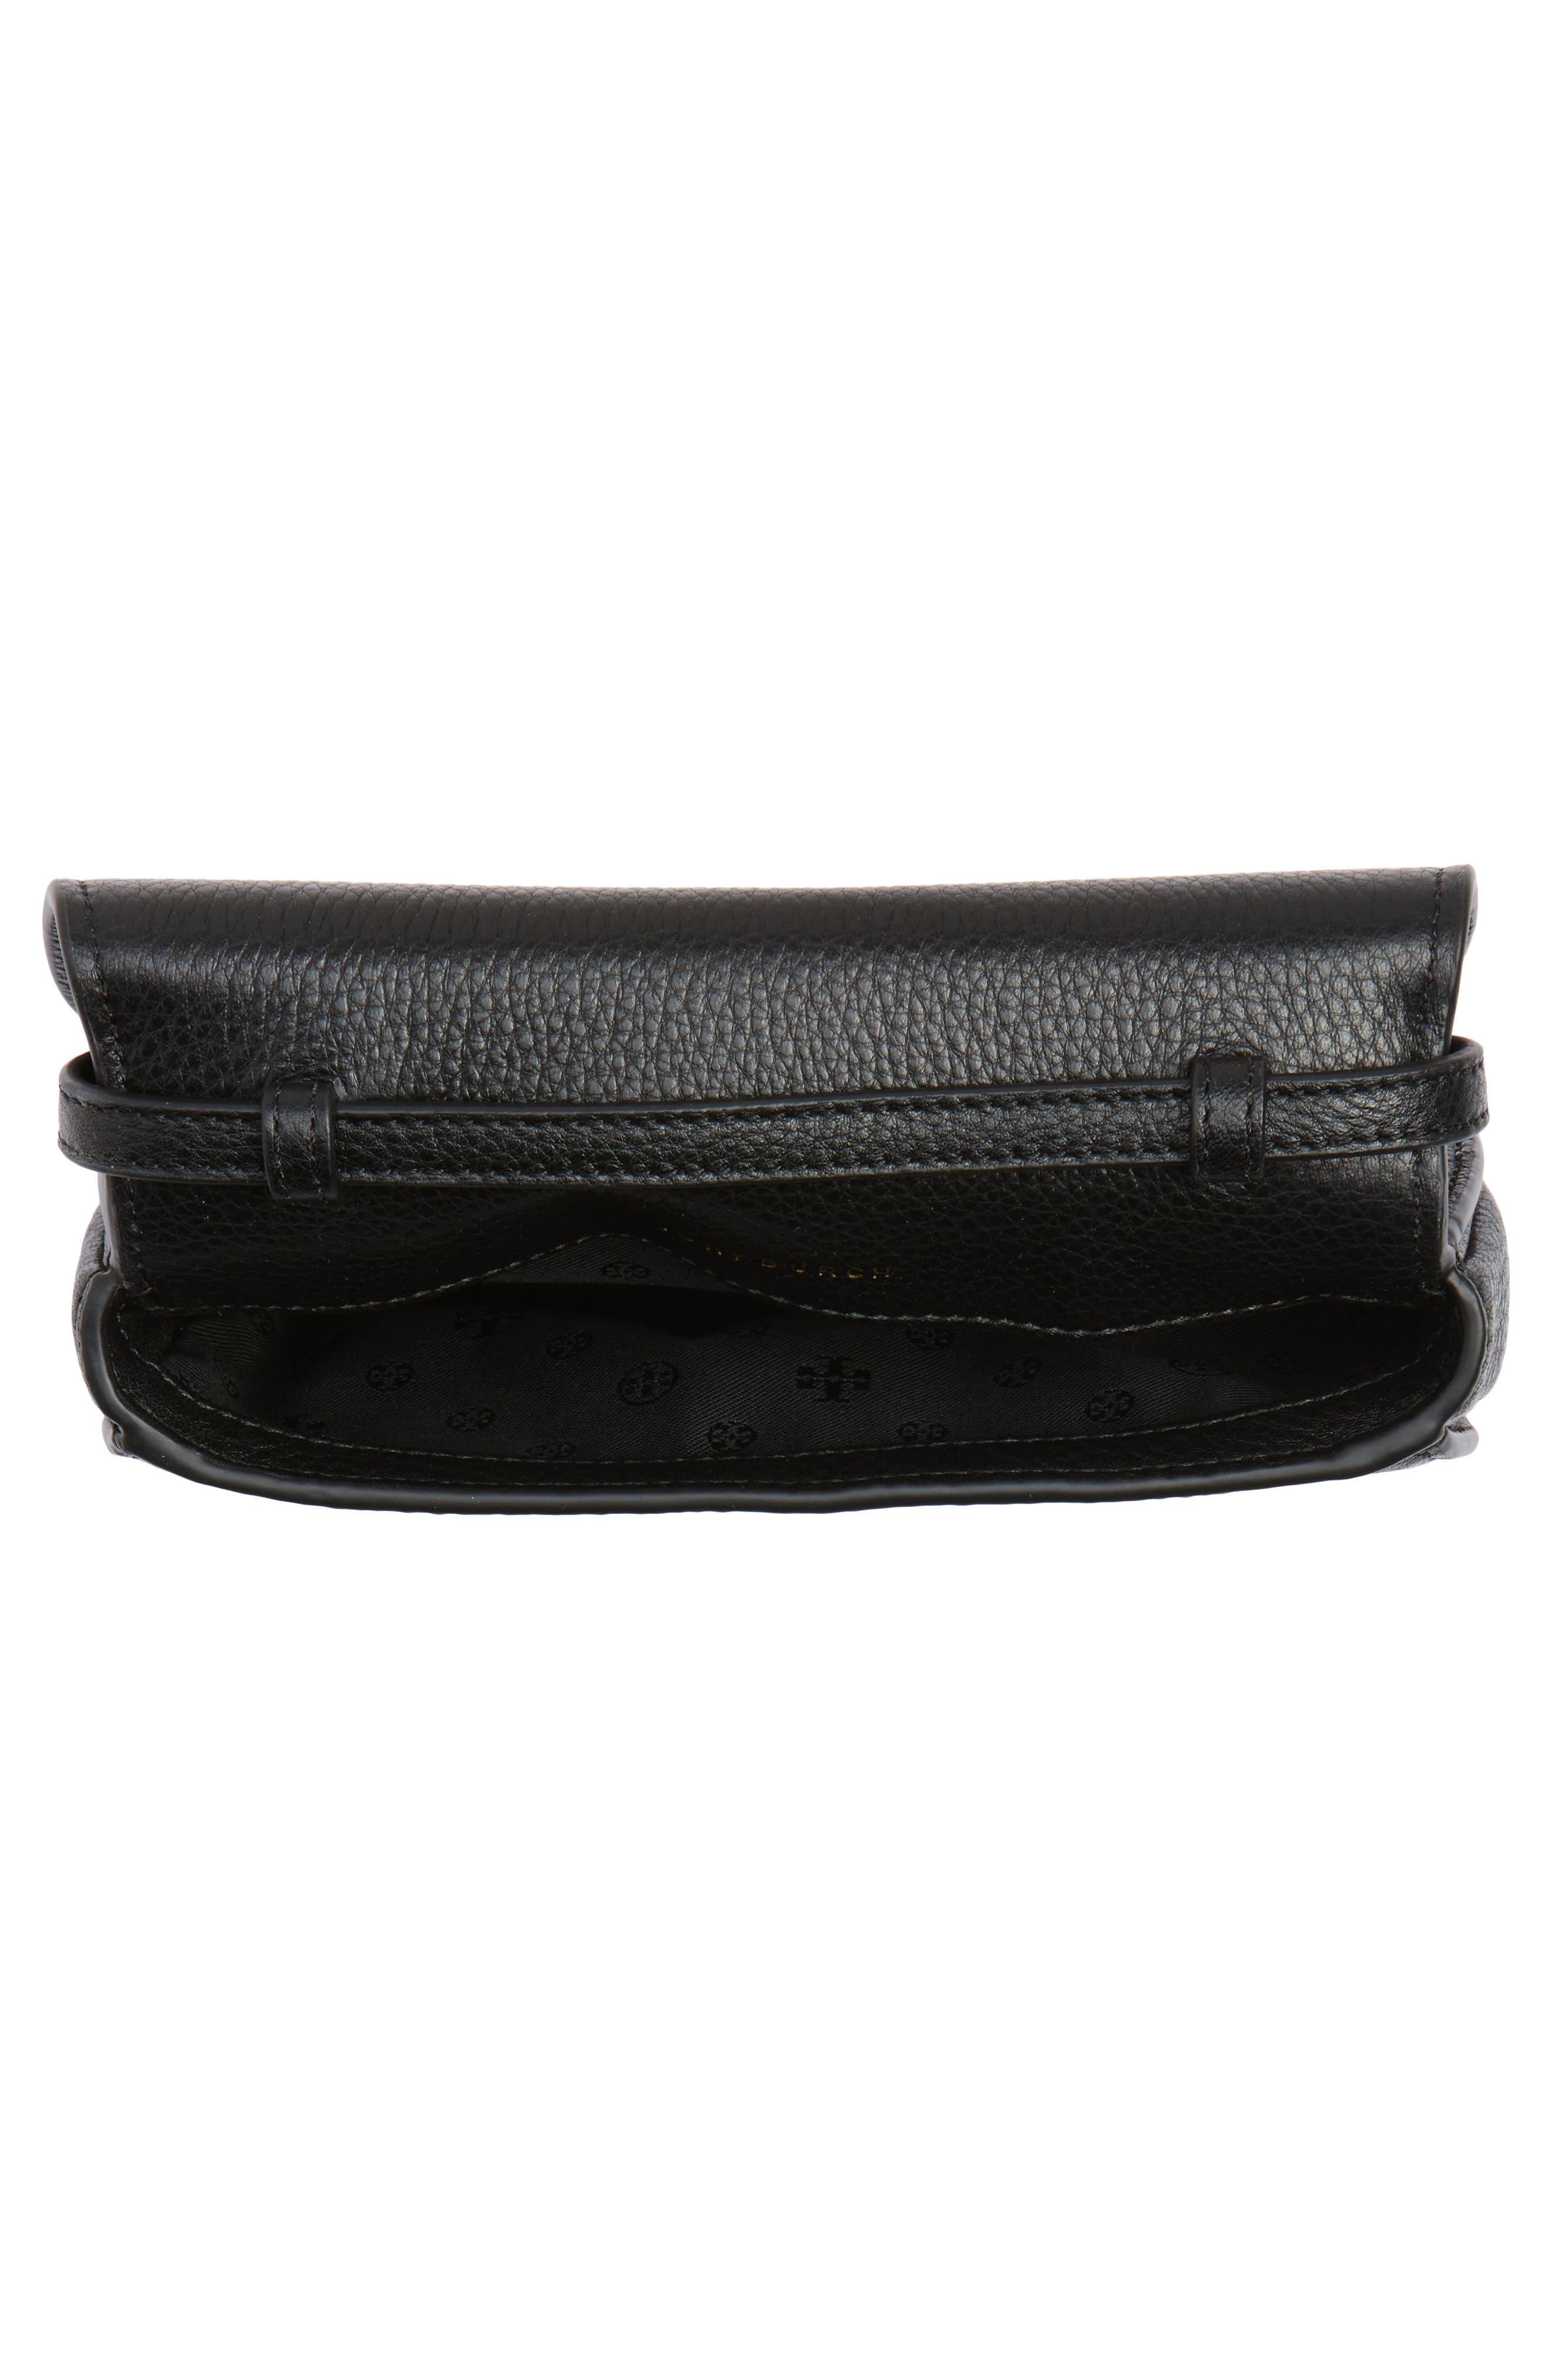 Mini Jamie Leather Crossbody Bag,                             Alternate thumbnail 4, color,                             Black